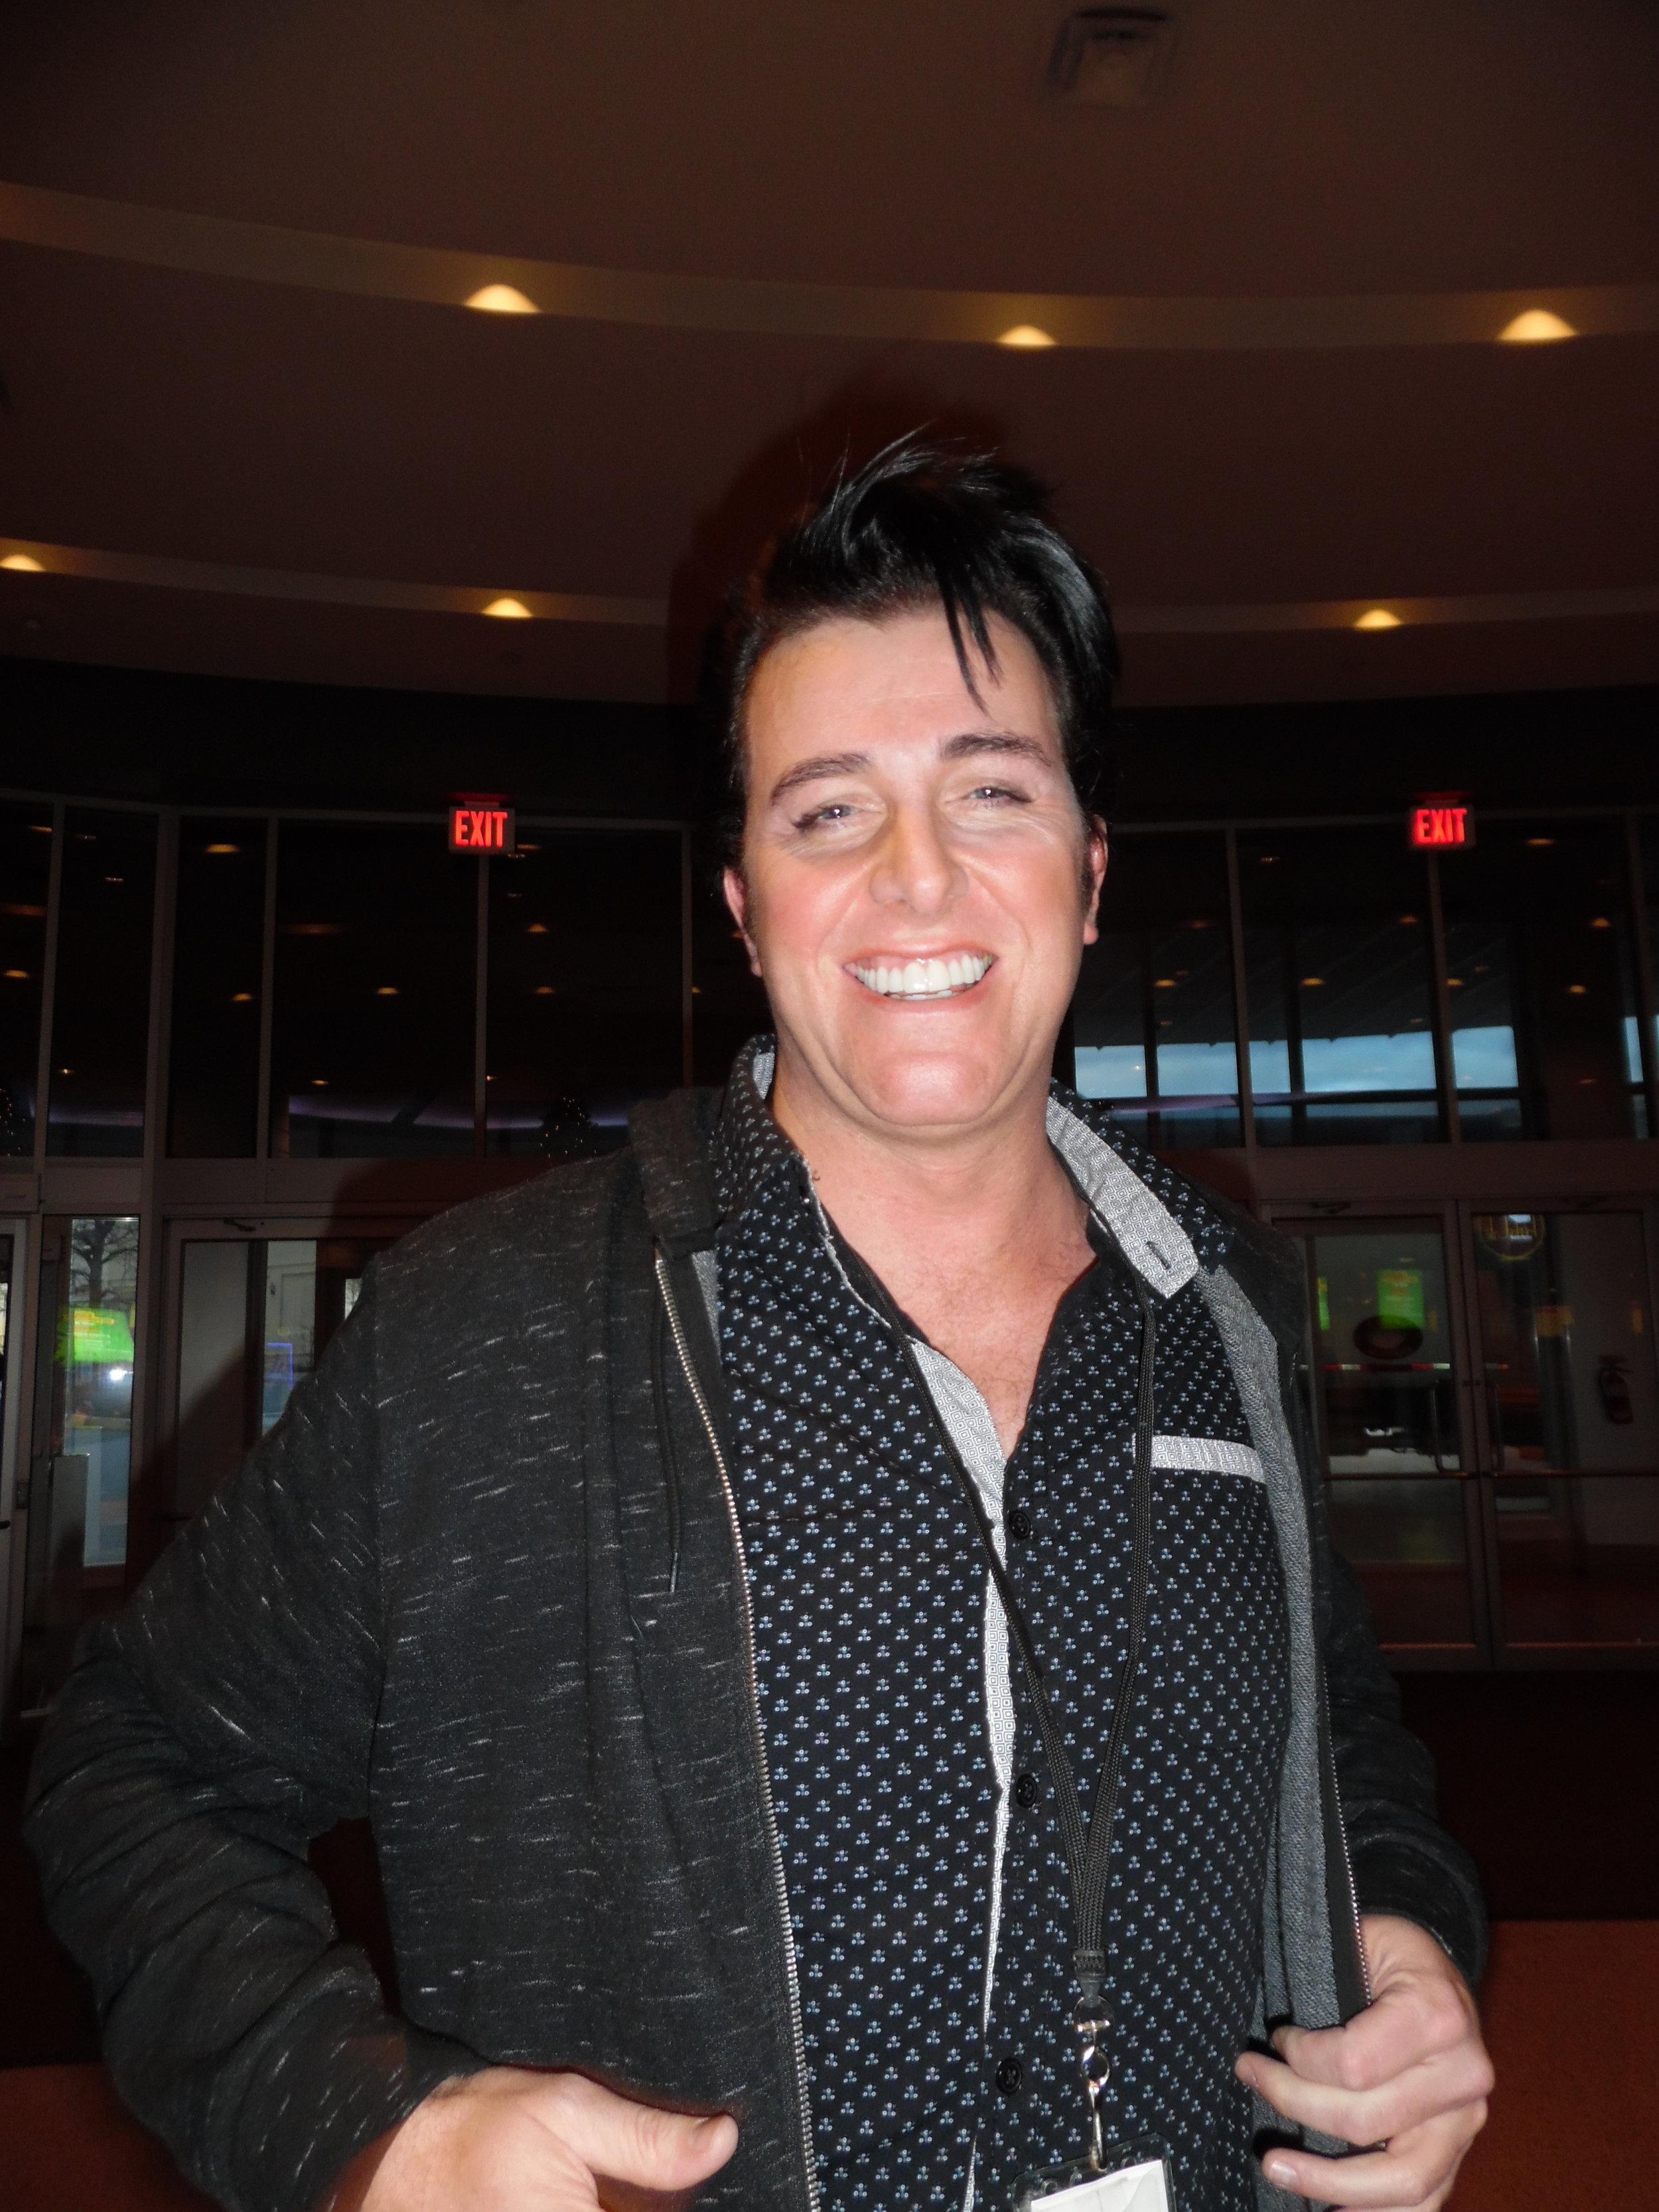 ETA  Matt Cage  during intermission at Casino Niagara, November 22nd, 2017.